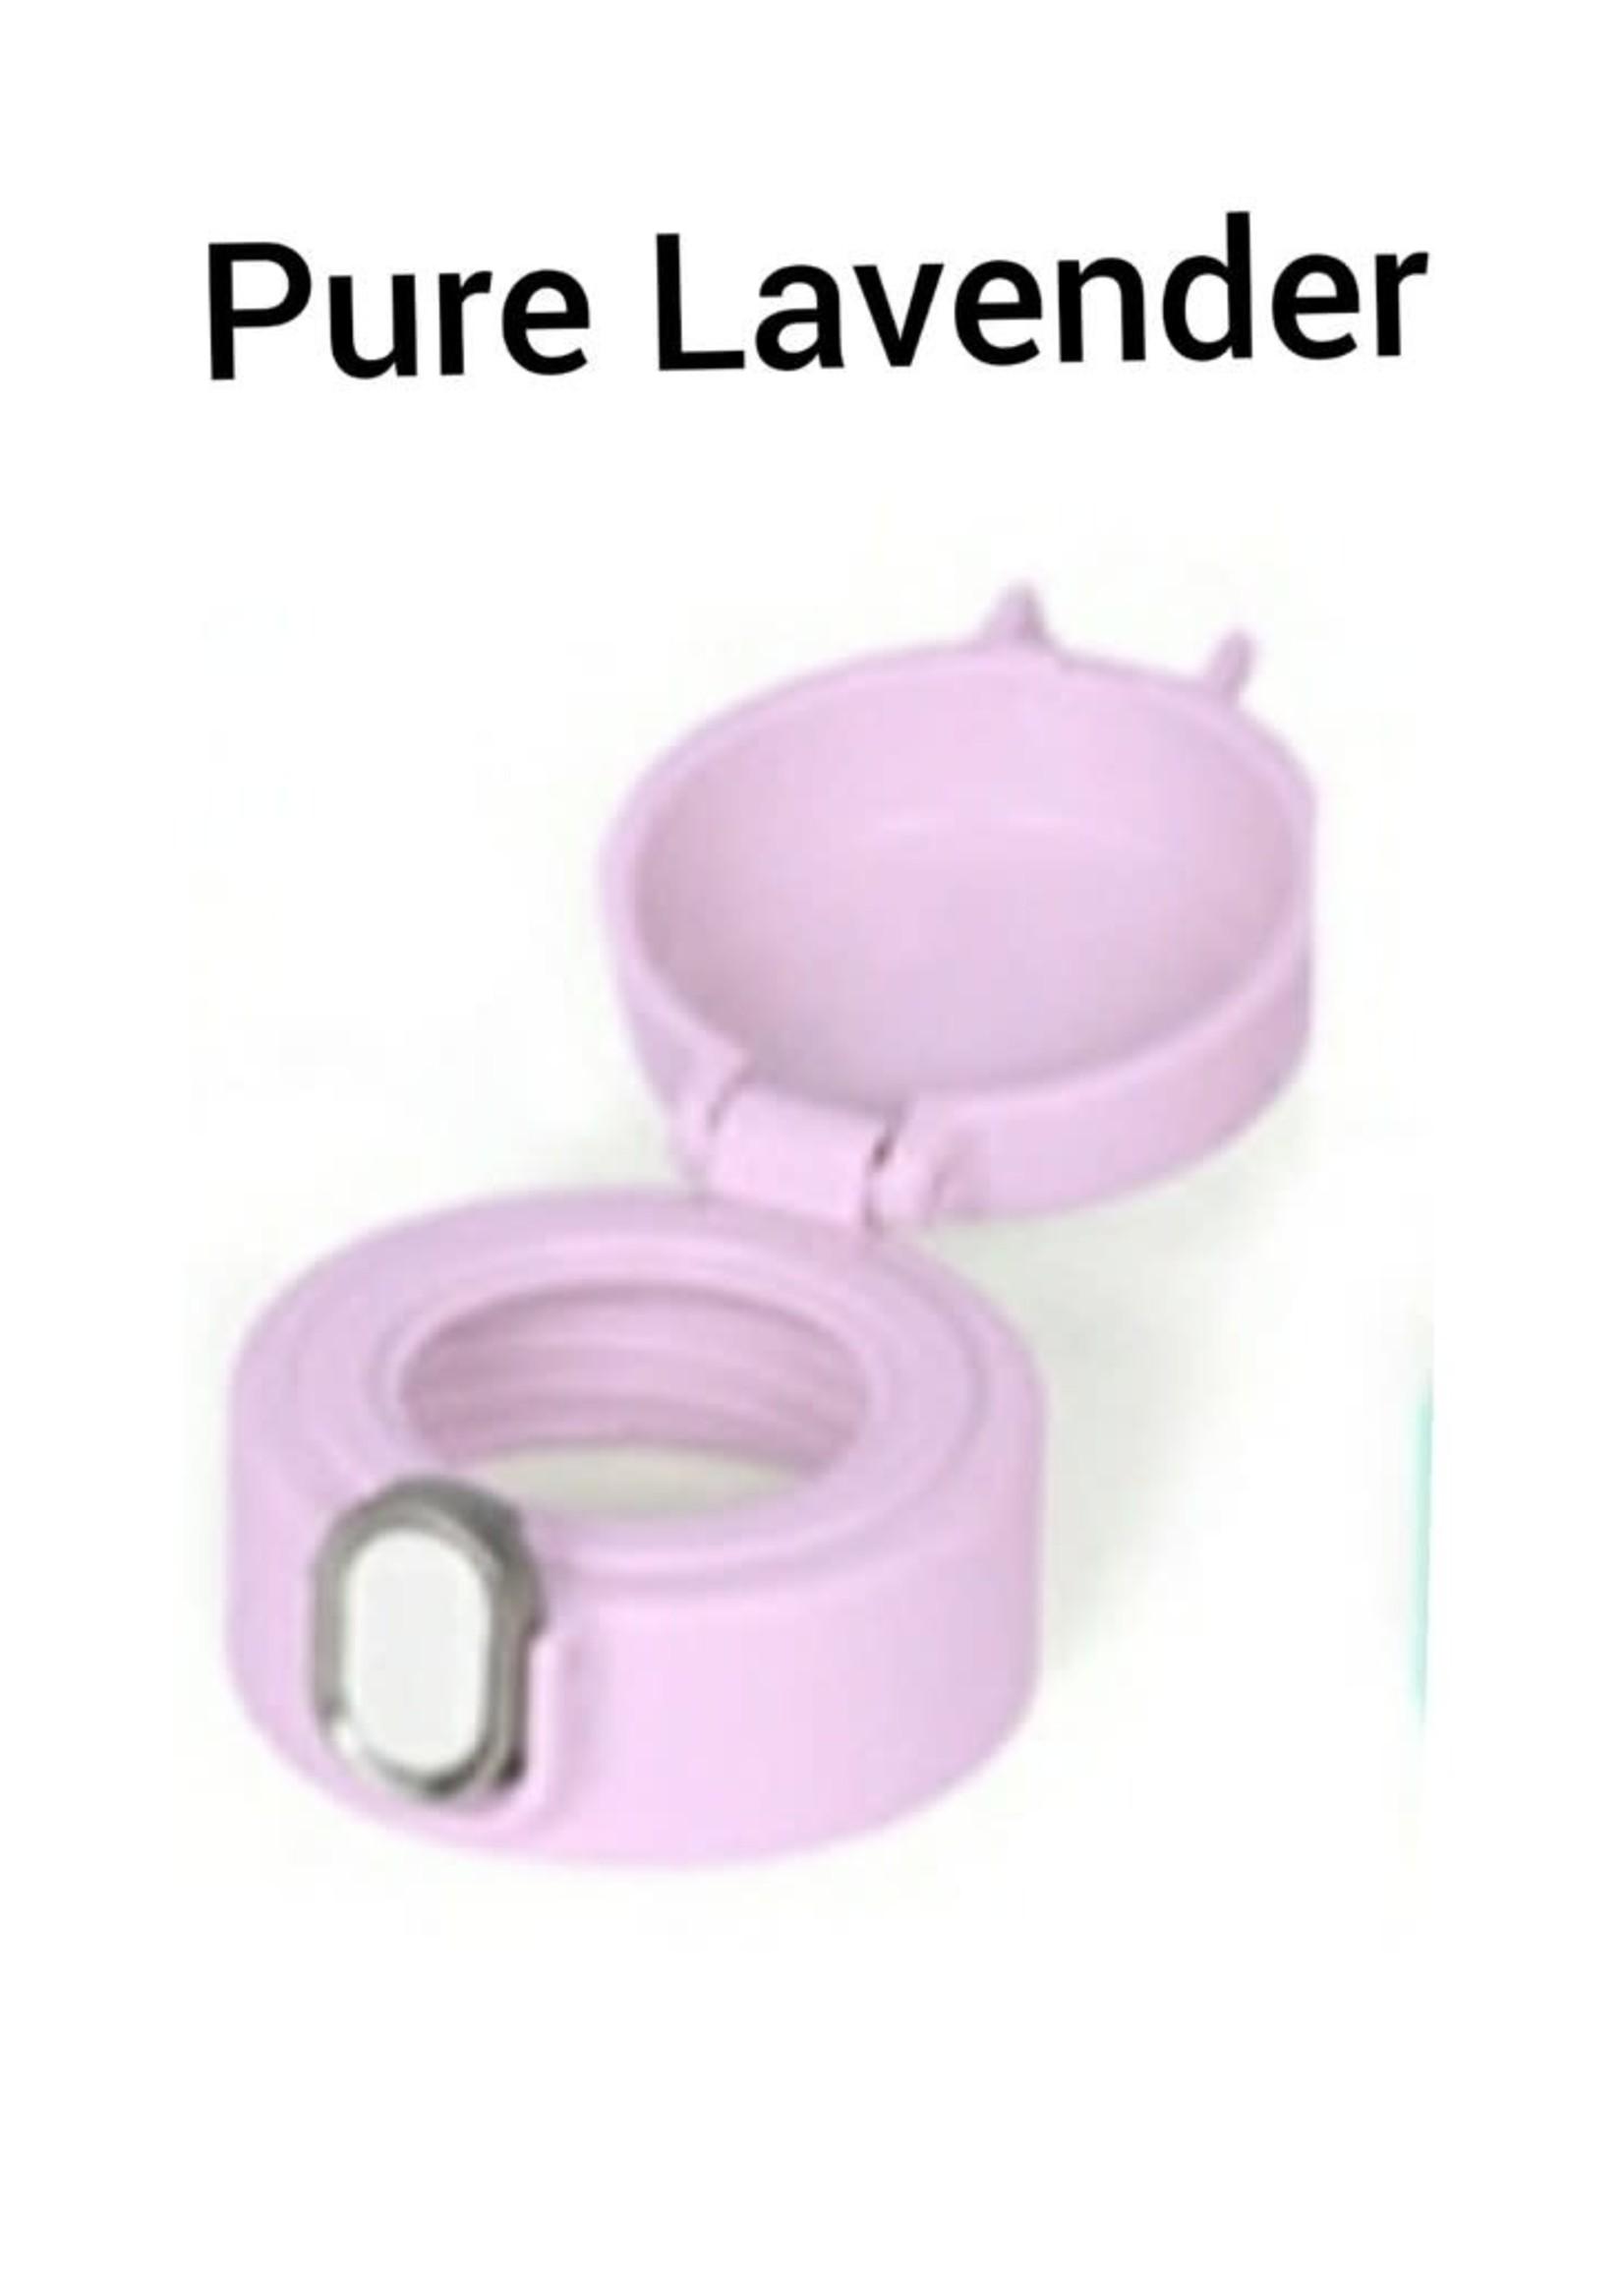 Grosmimi Grosmimi One Touch Cap V2 (Pure Lavender)